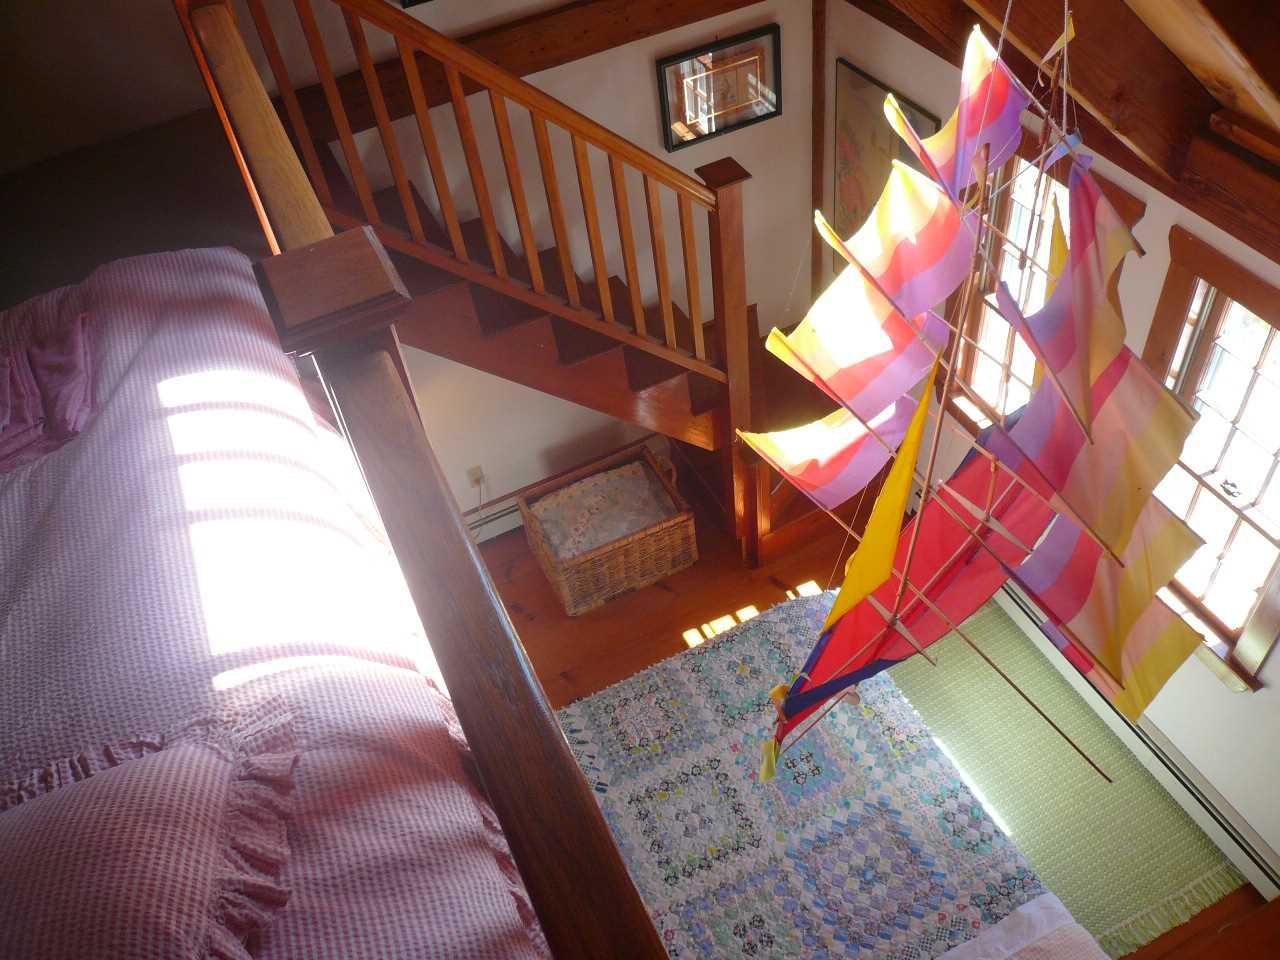 Loft stairs in Bedroom #3